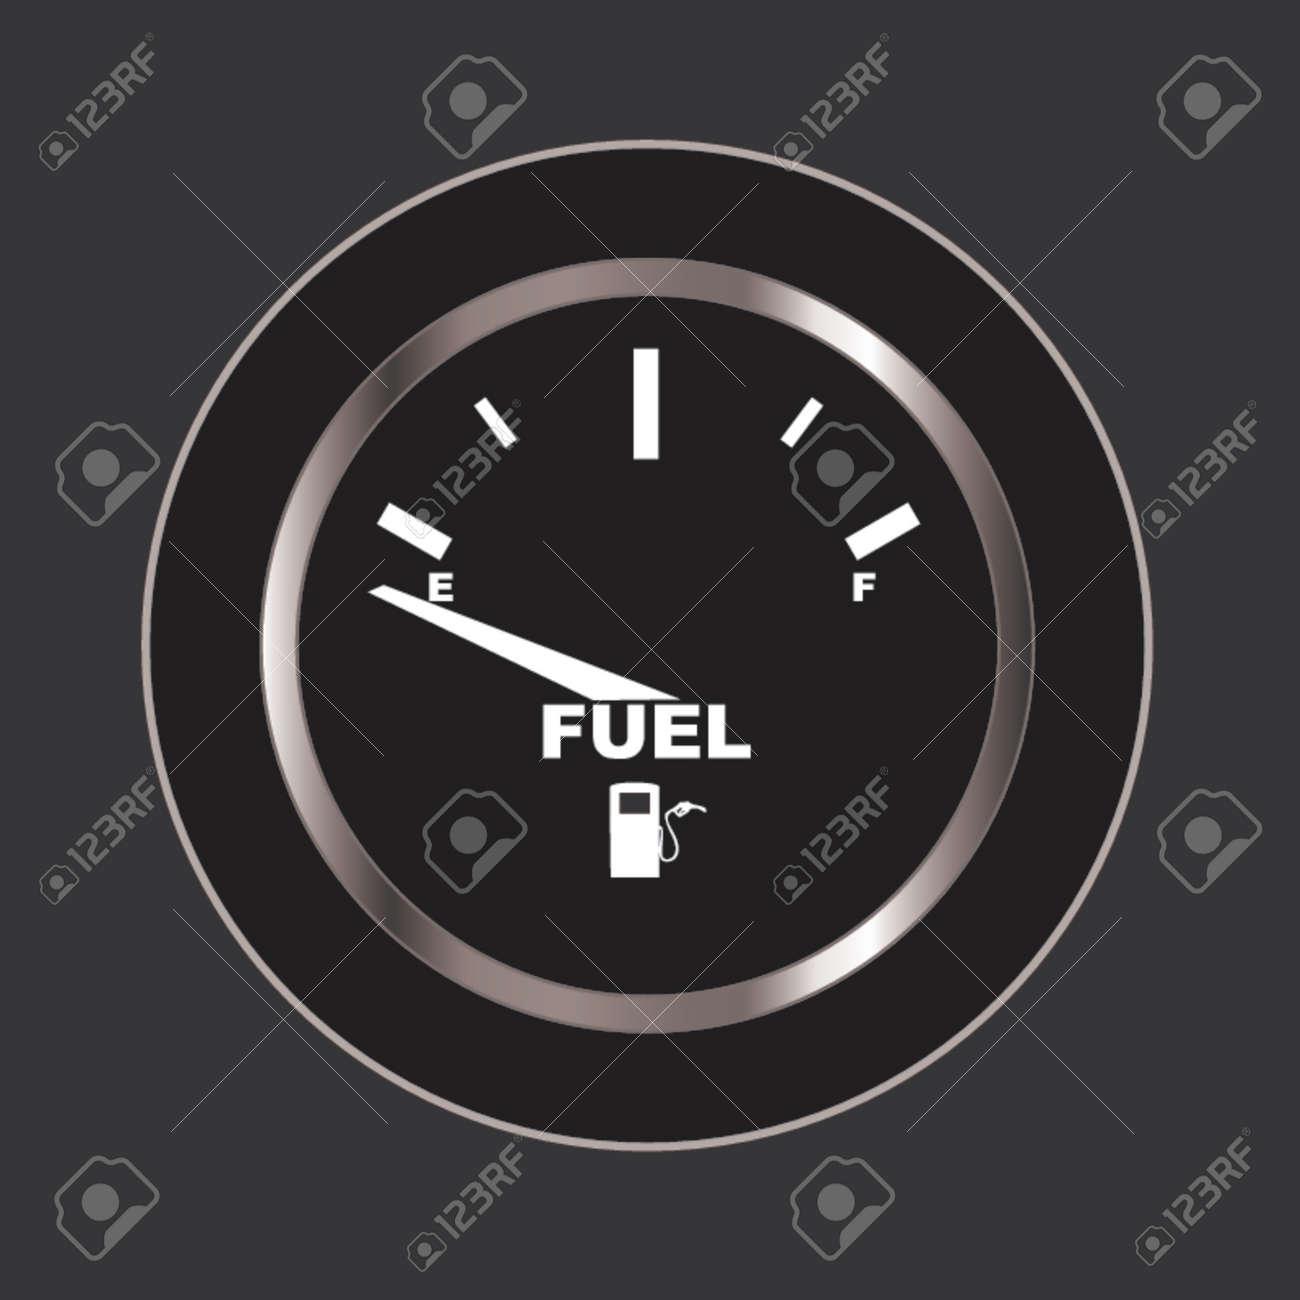 Vector image of a fuel gauge, shows empty. Stock Vector - 741004